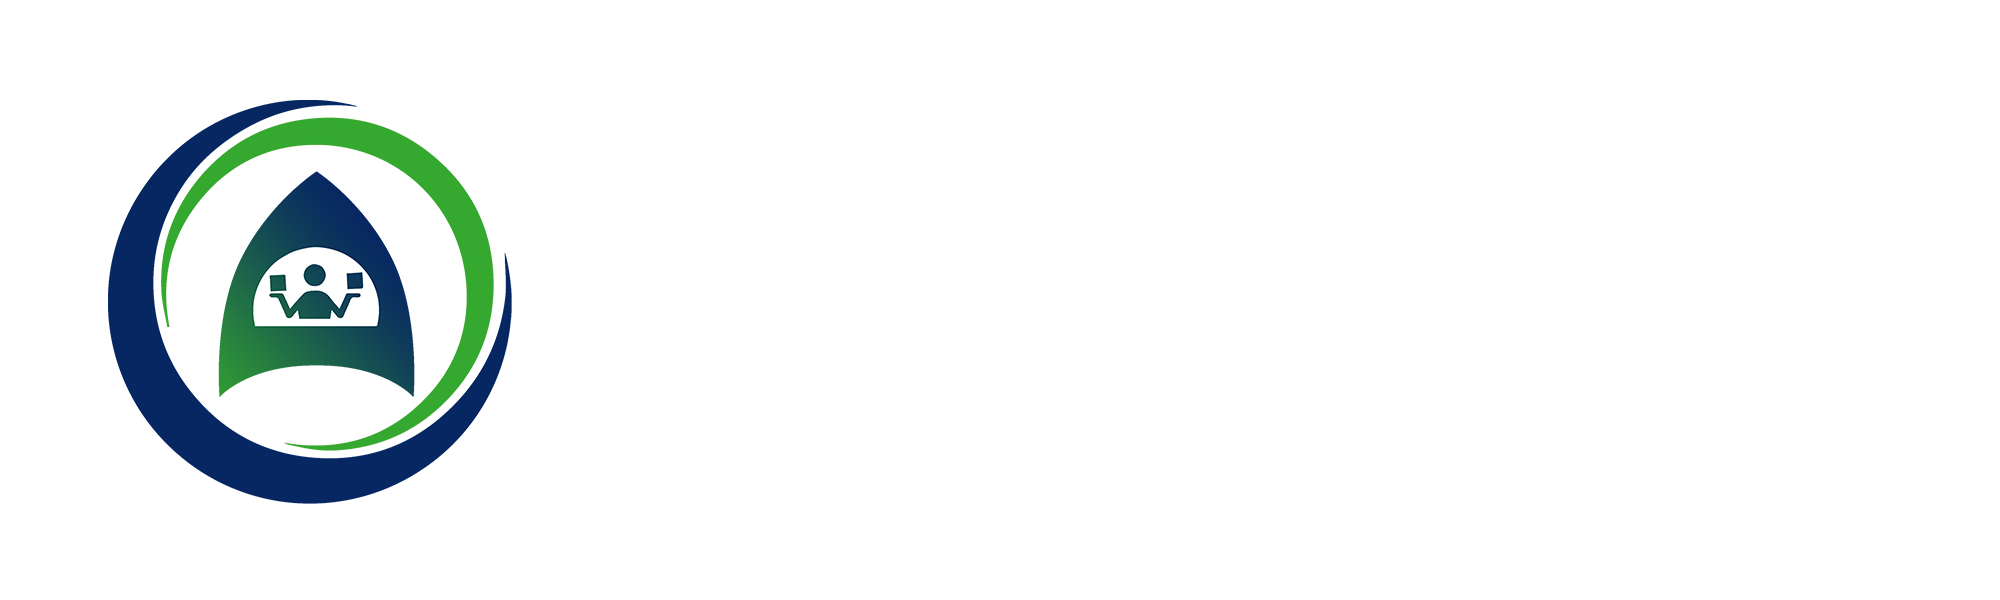 Comparegulf